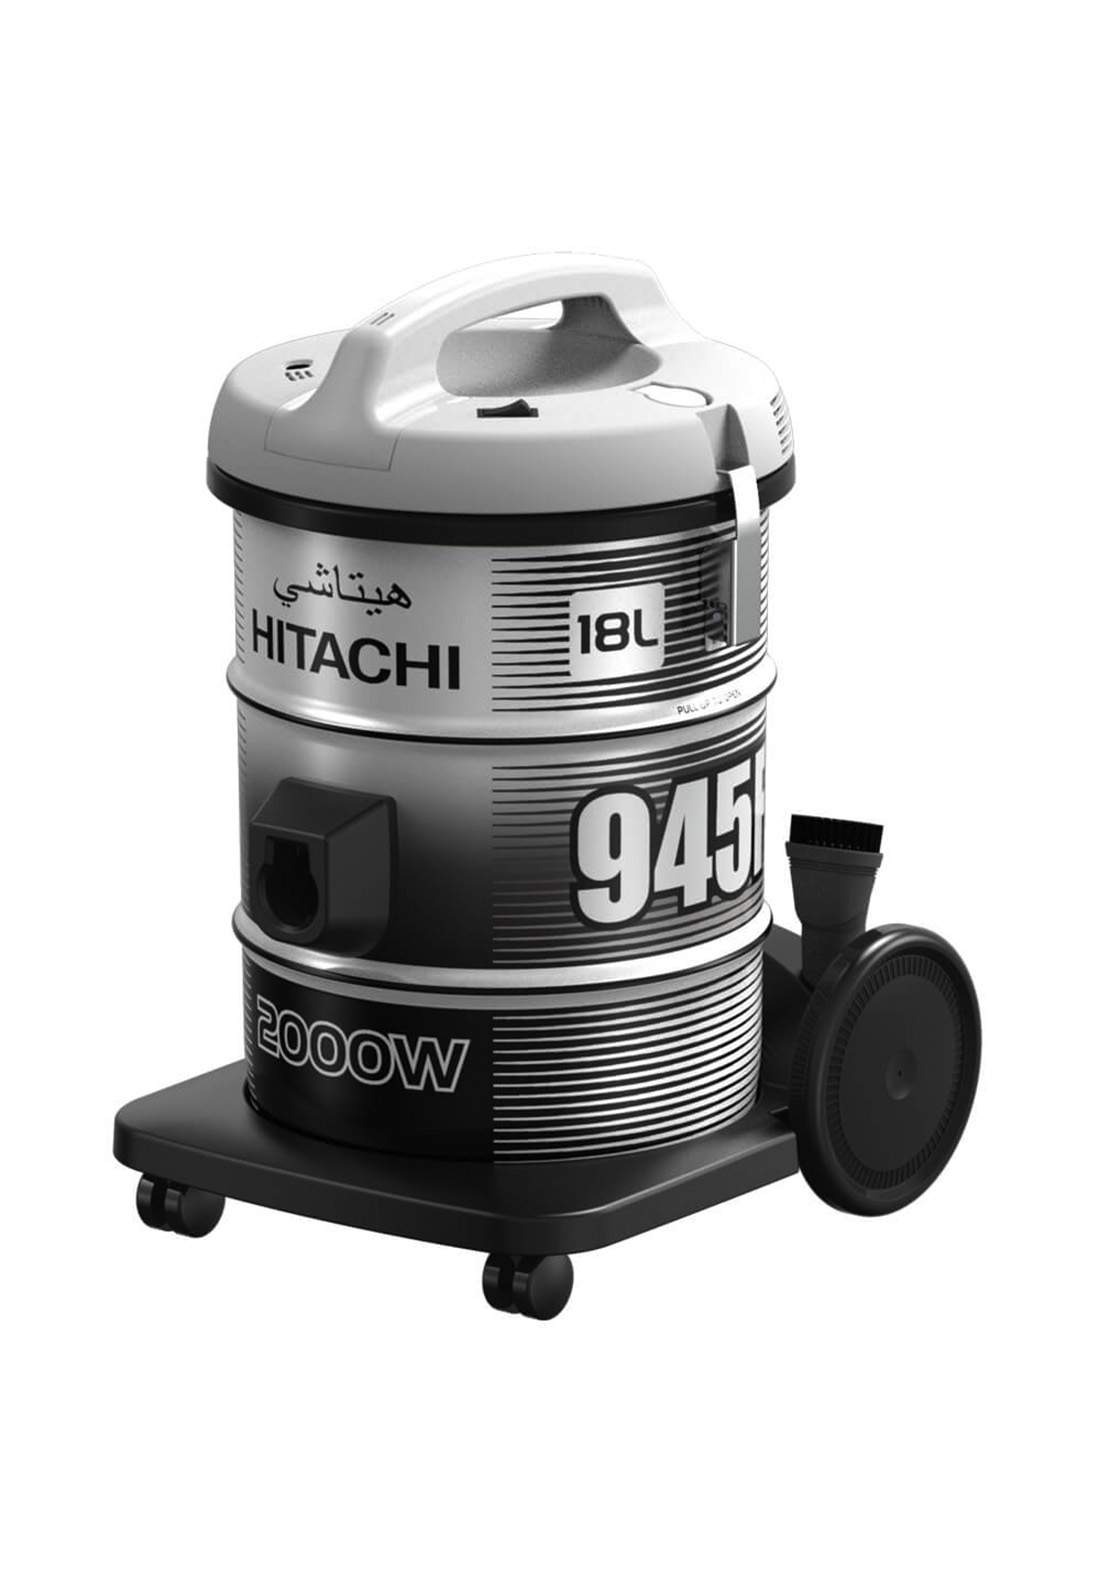 Hitachi CV-945F Vacuum Cleaner  مكنسة